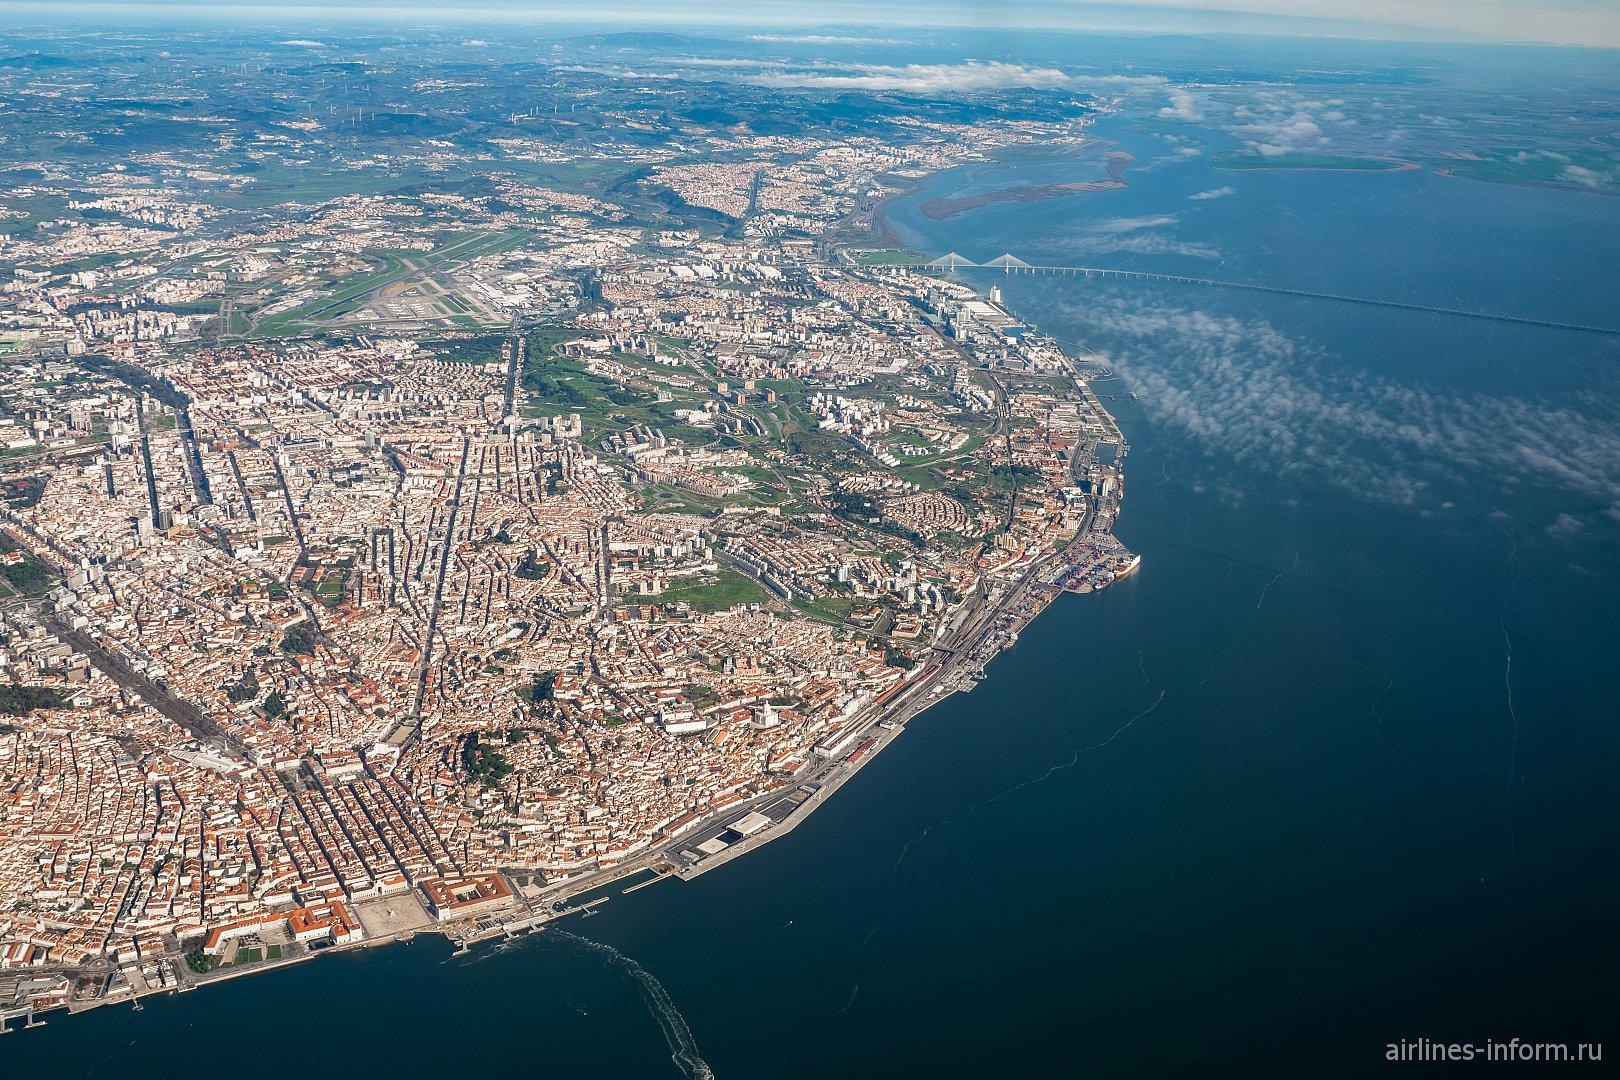 Город Лиссабон, река Тахо и 12-километровый мост Васко да Гама